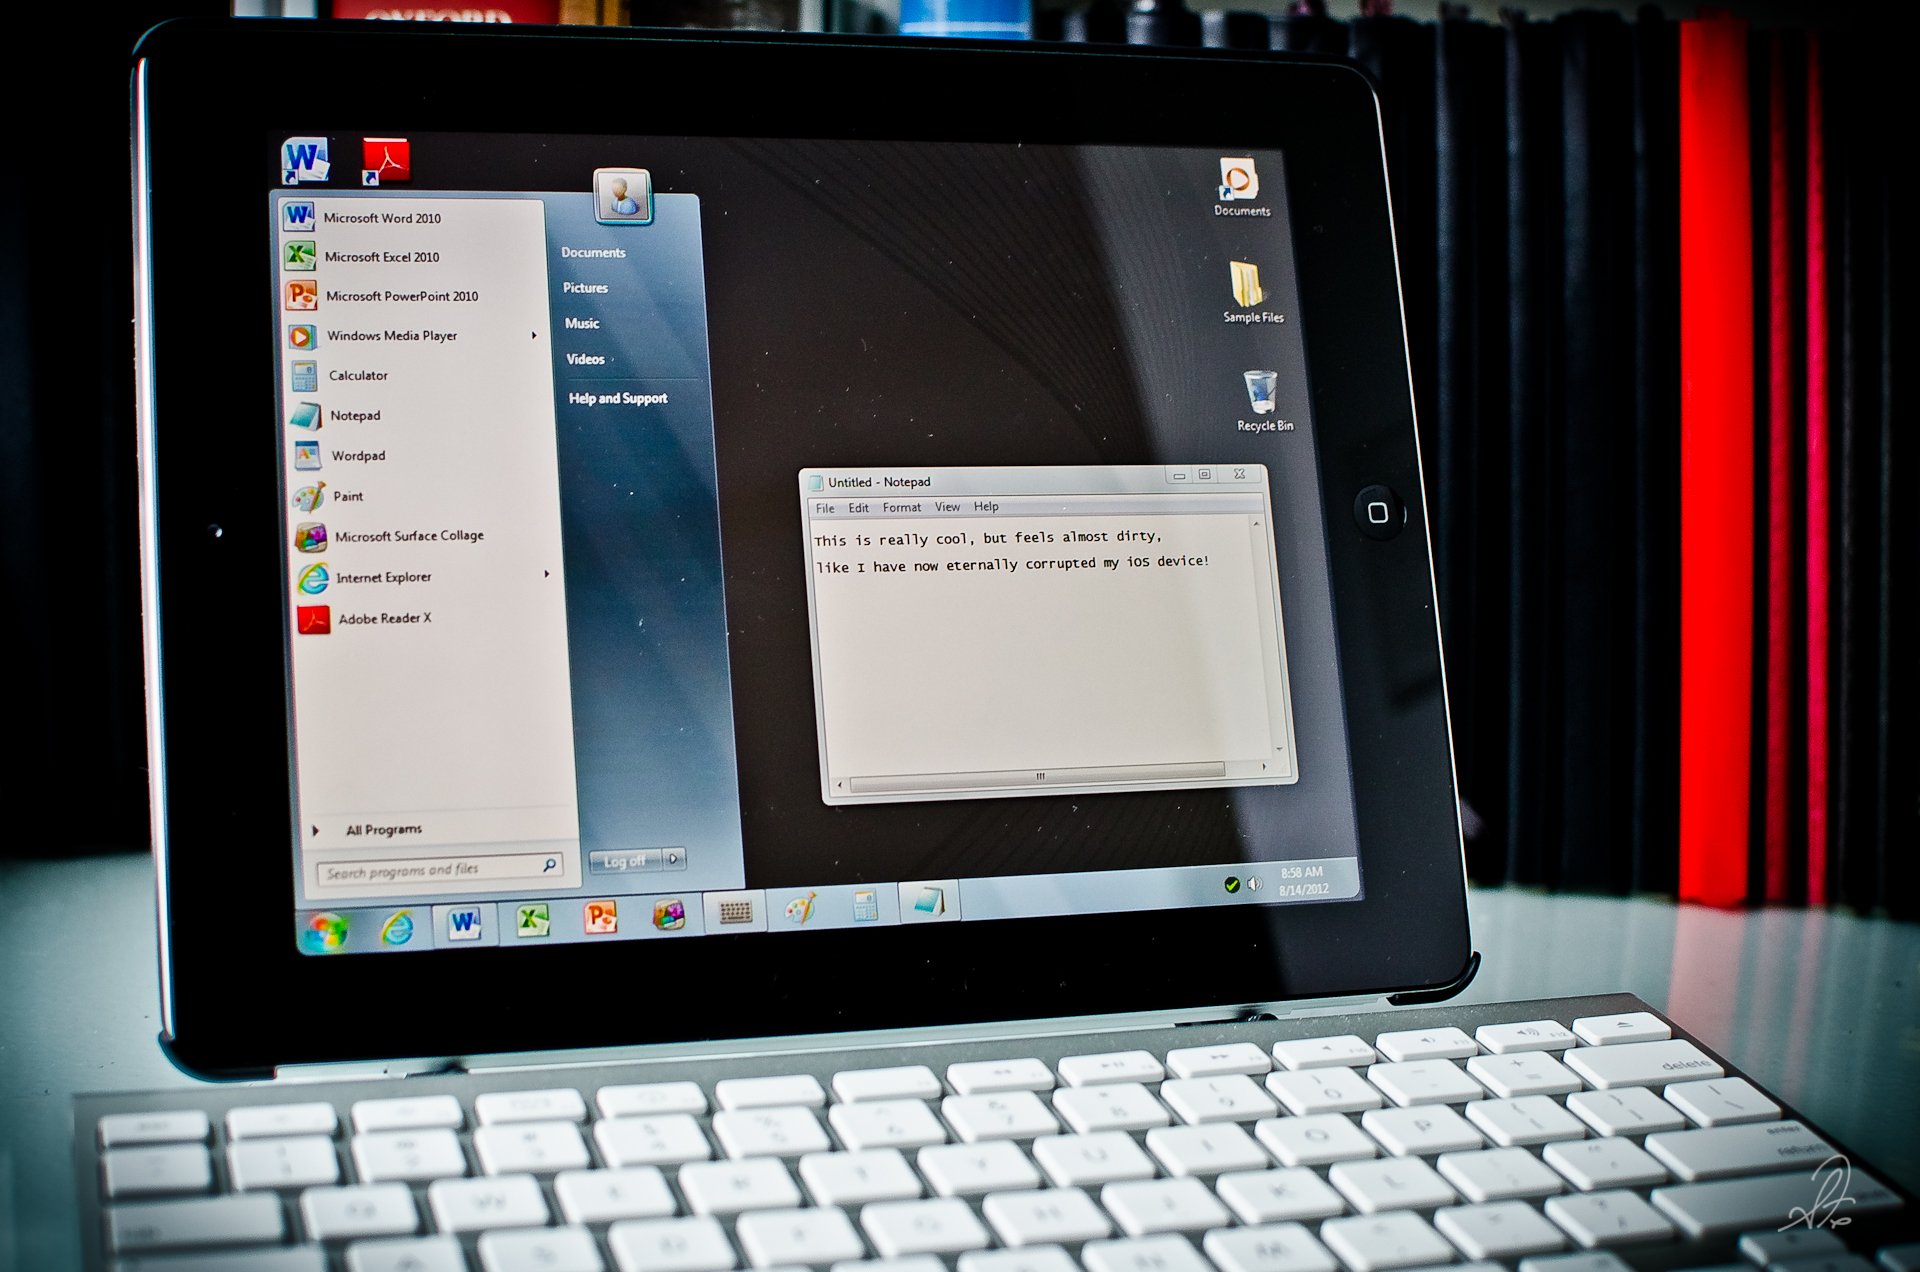 Running Windows 7 on an iPad iOS Device